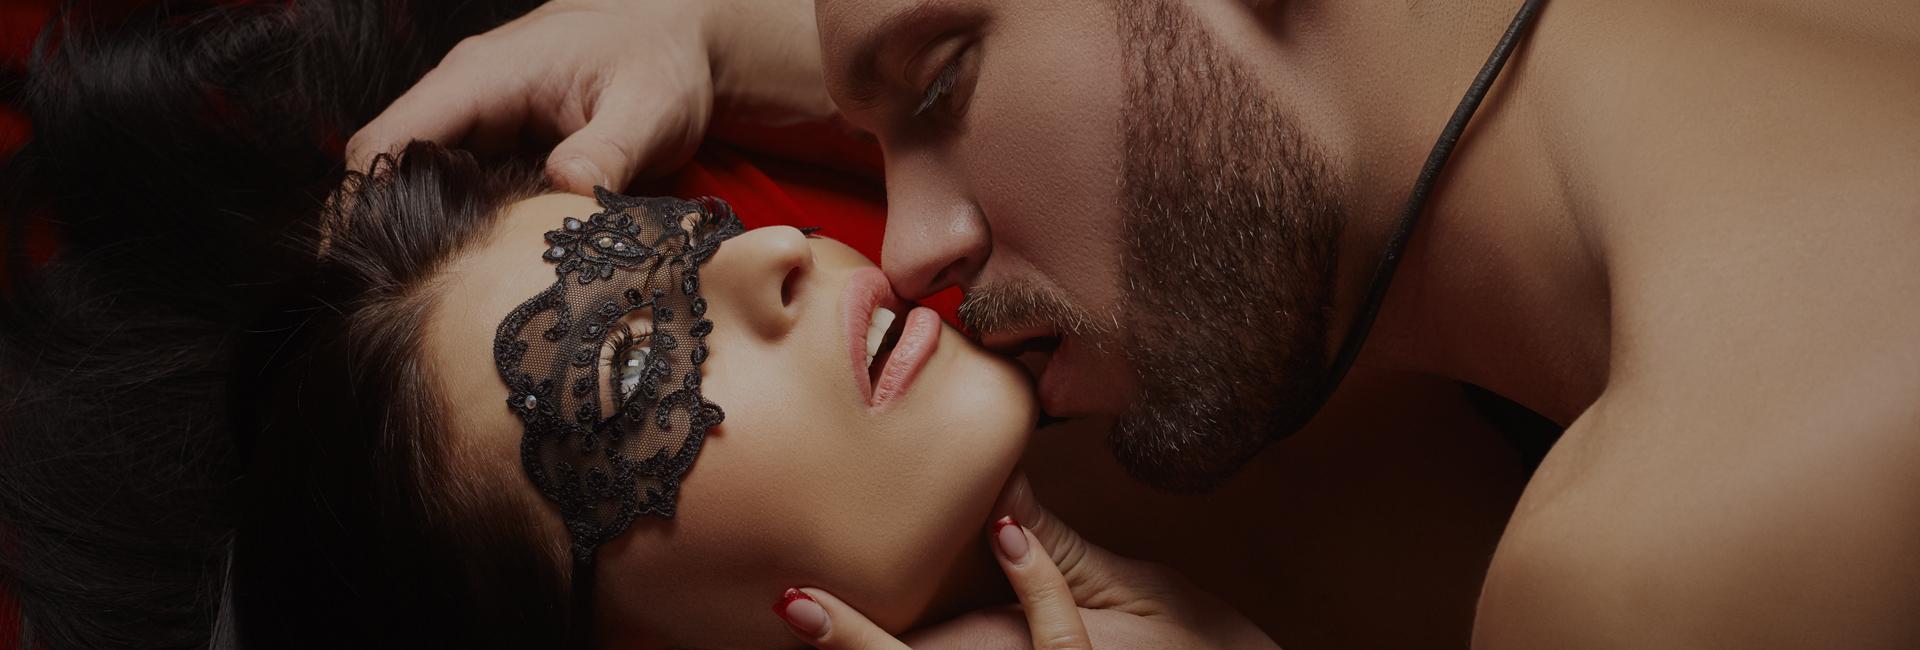 sexe shop en ligne mr sexe com